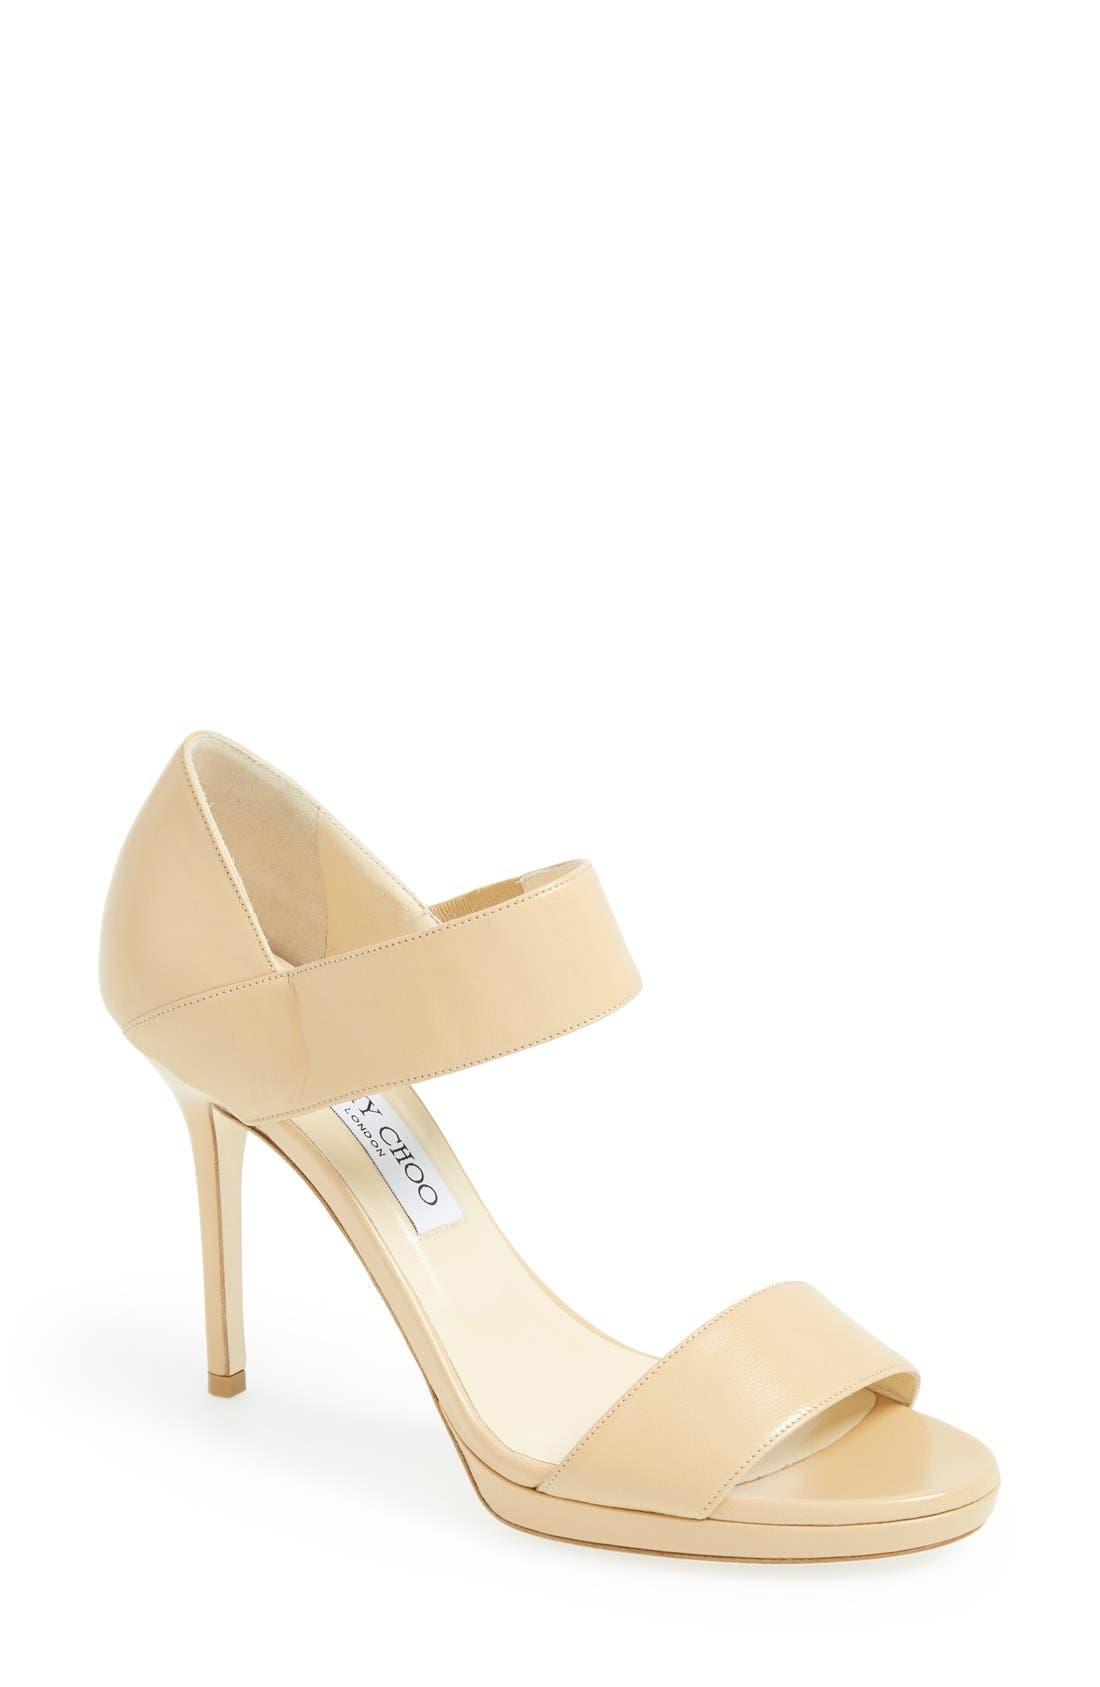 Main Image - Jimmy Choo 'Alana' Platform Sandal (Women)